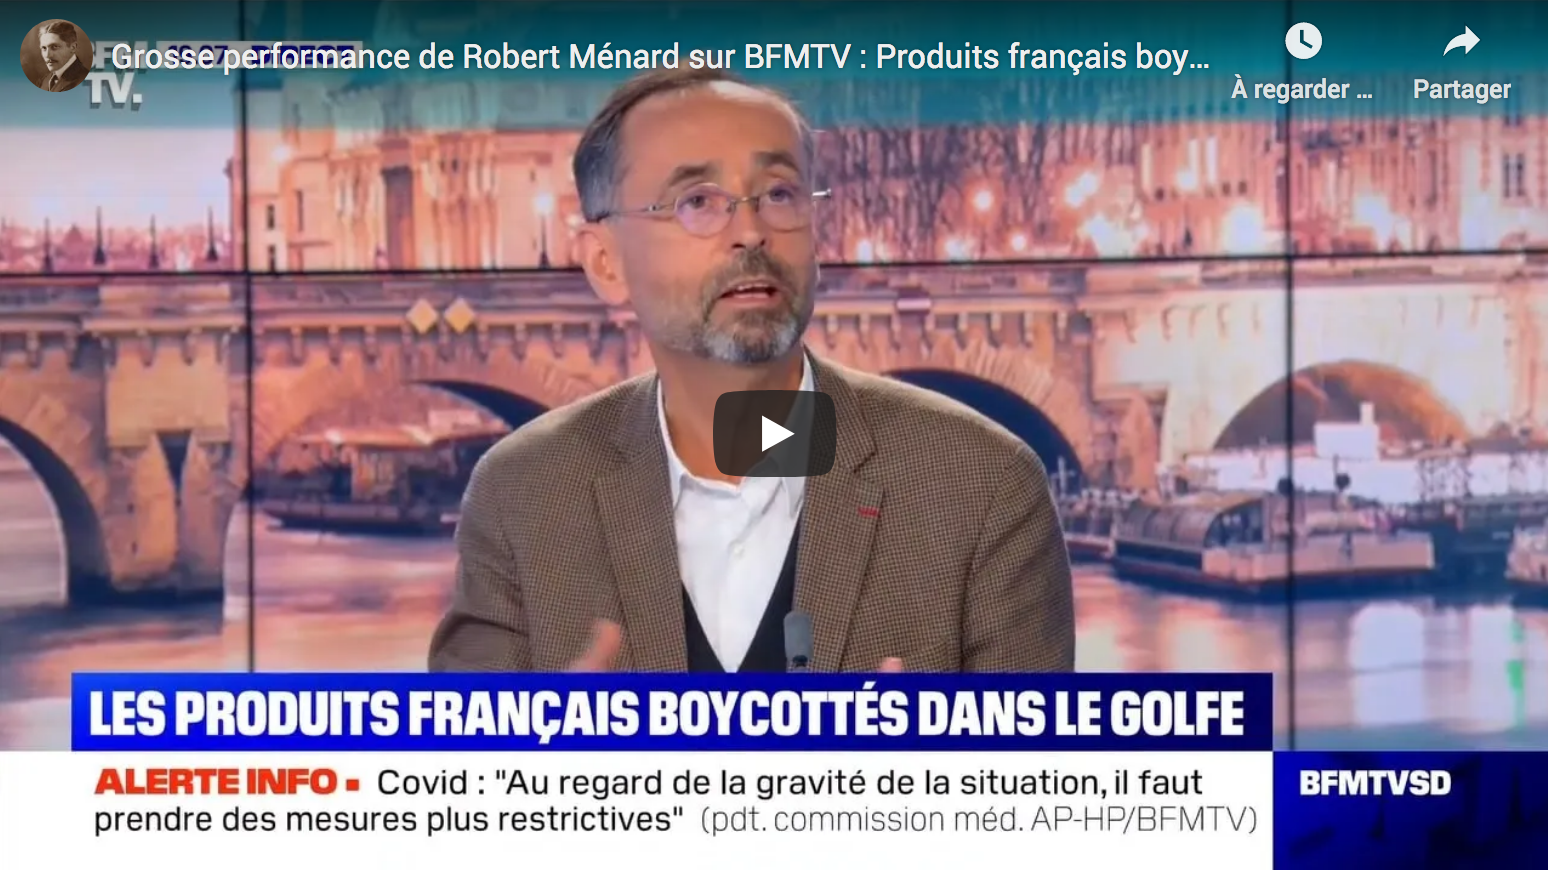 Grosse performance de Robert Ménard sur BFM TV : Produits français boycottés, Erdogan vs Macron, etc. (VIDÉO)